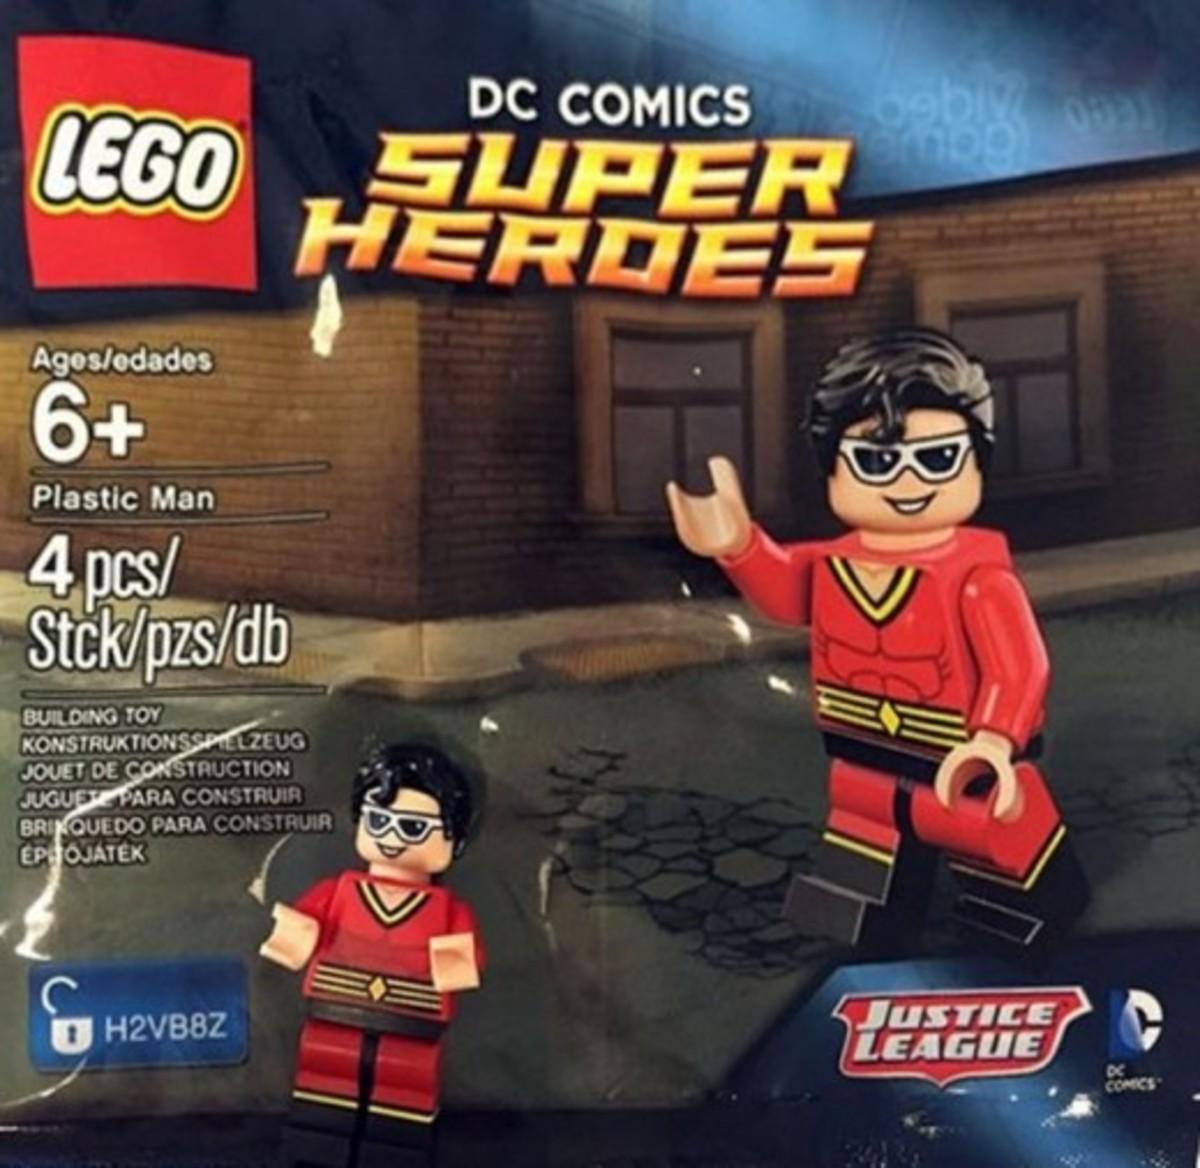 LEGO Plastic Man Polybag Front